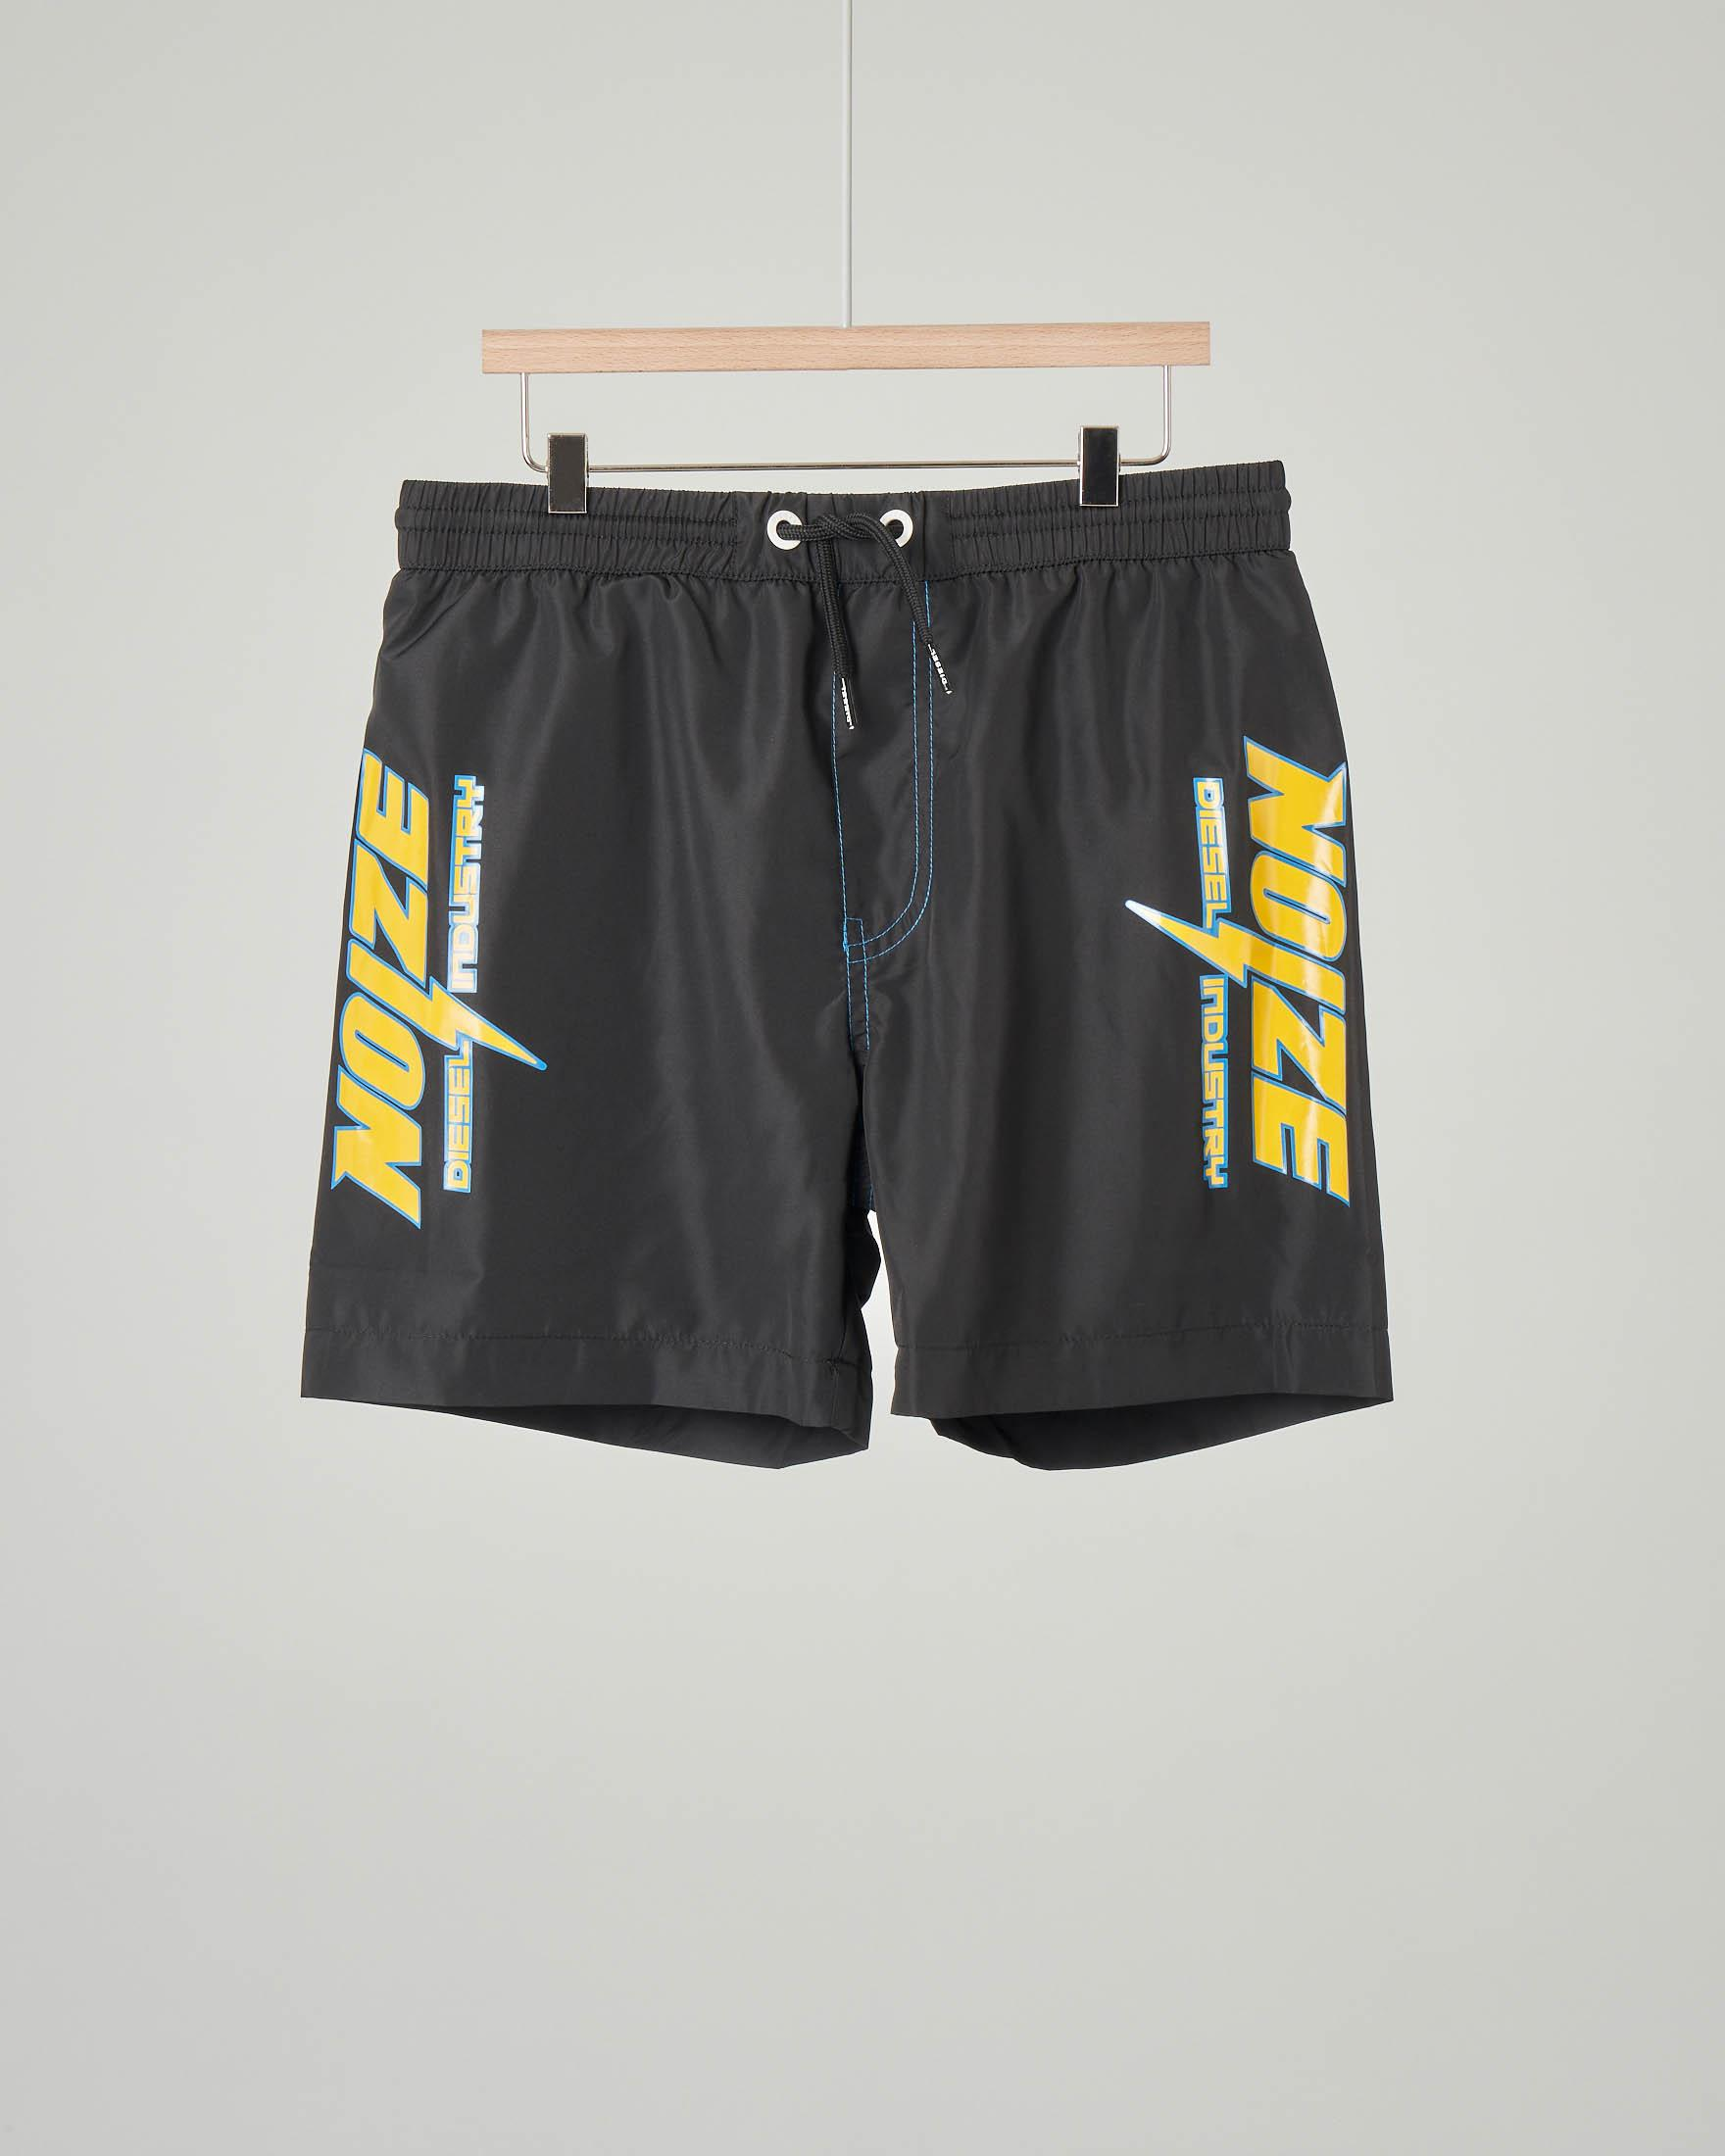 Costume boxer nero con logo giallo